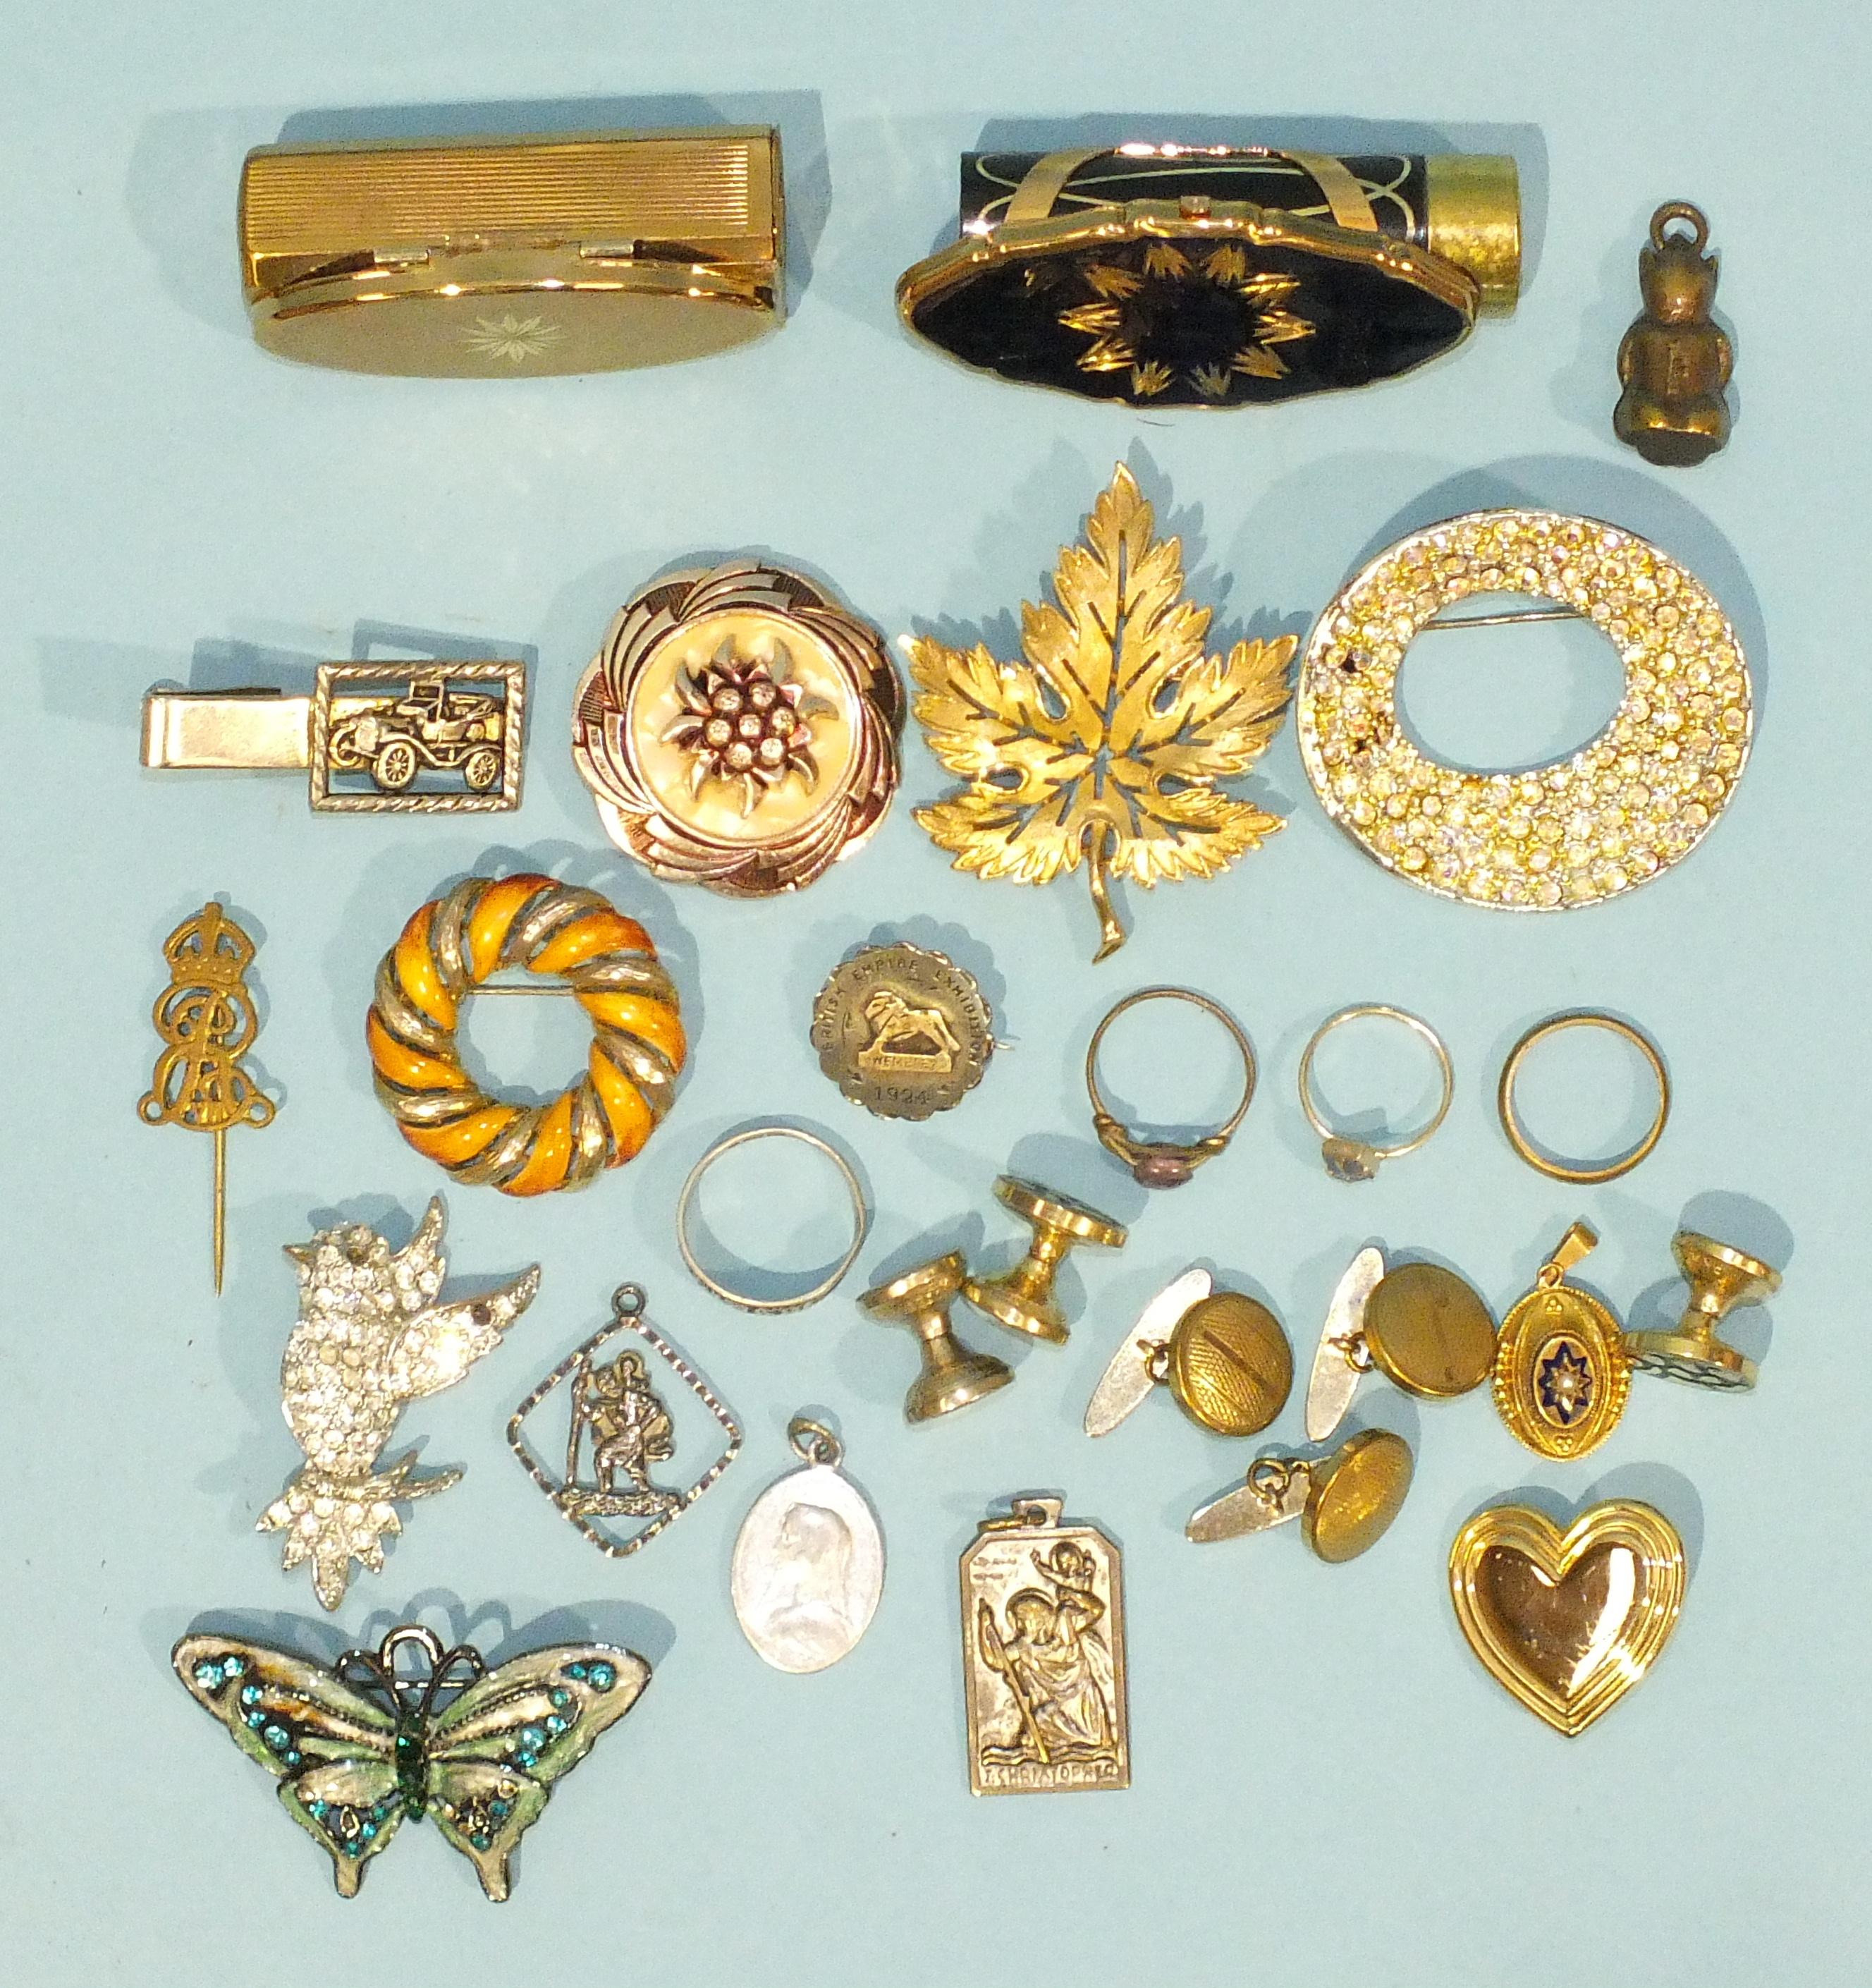 Lot 195 - A sterling silver British Empire Exhibition 1924 badge, a small Victorian pendant, etc.